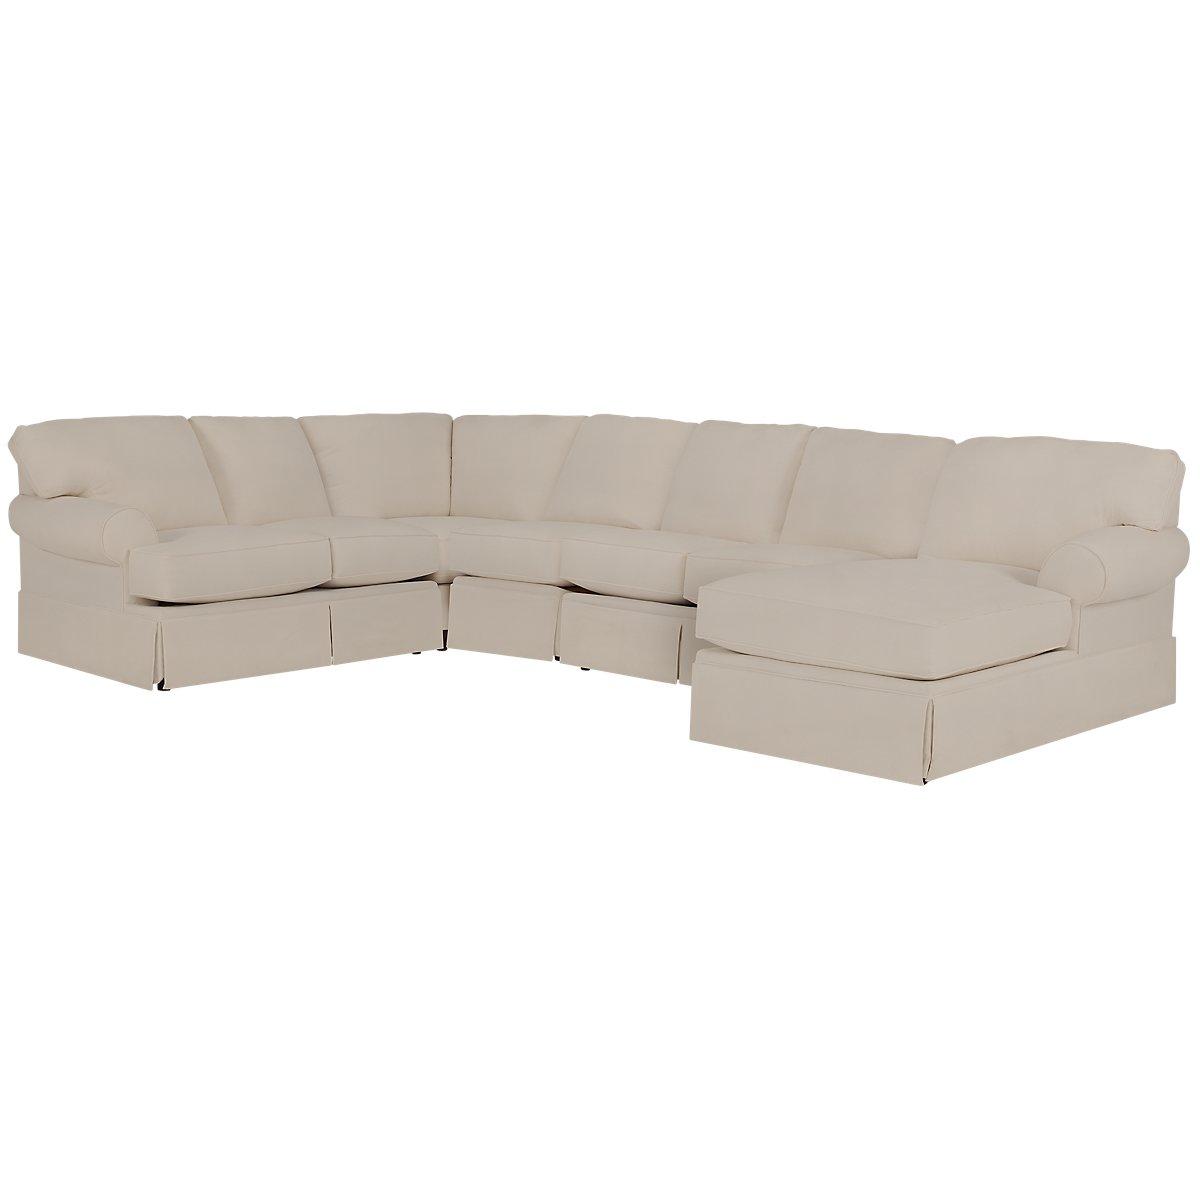 City furniture turner khaki fabric large right chaise for Chaise kaki